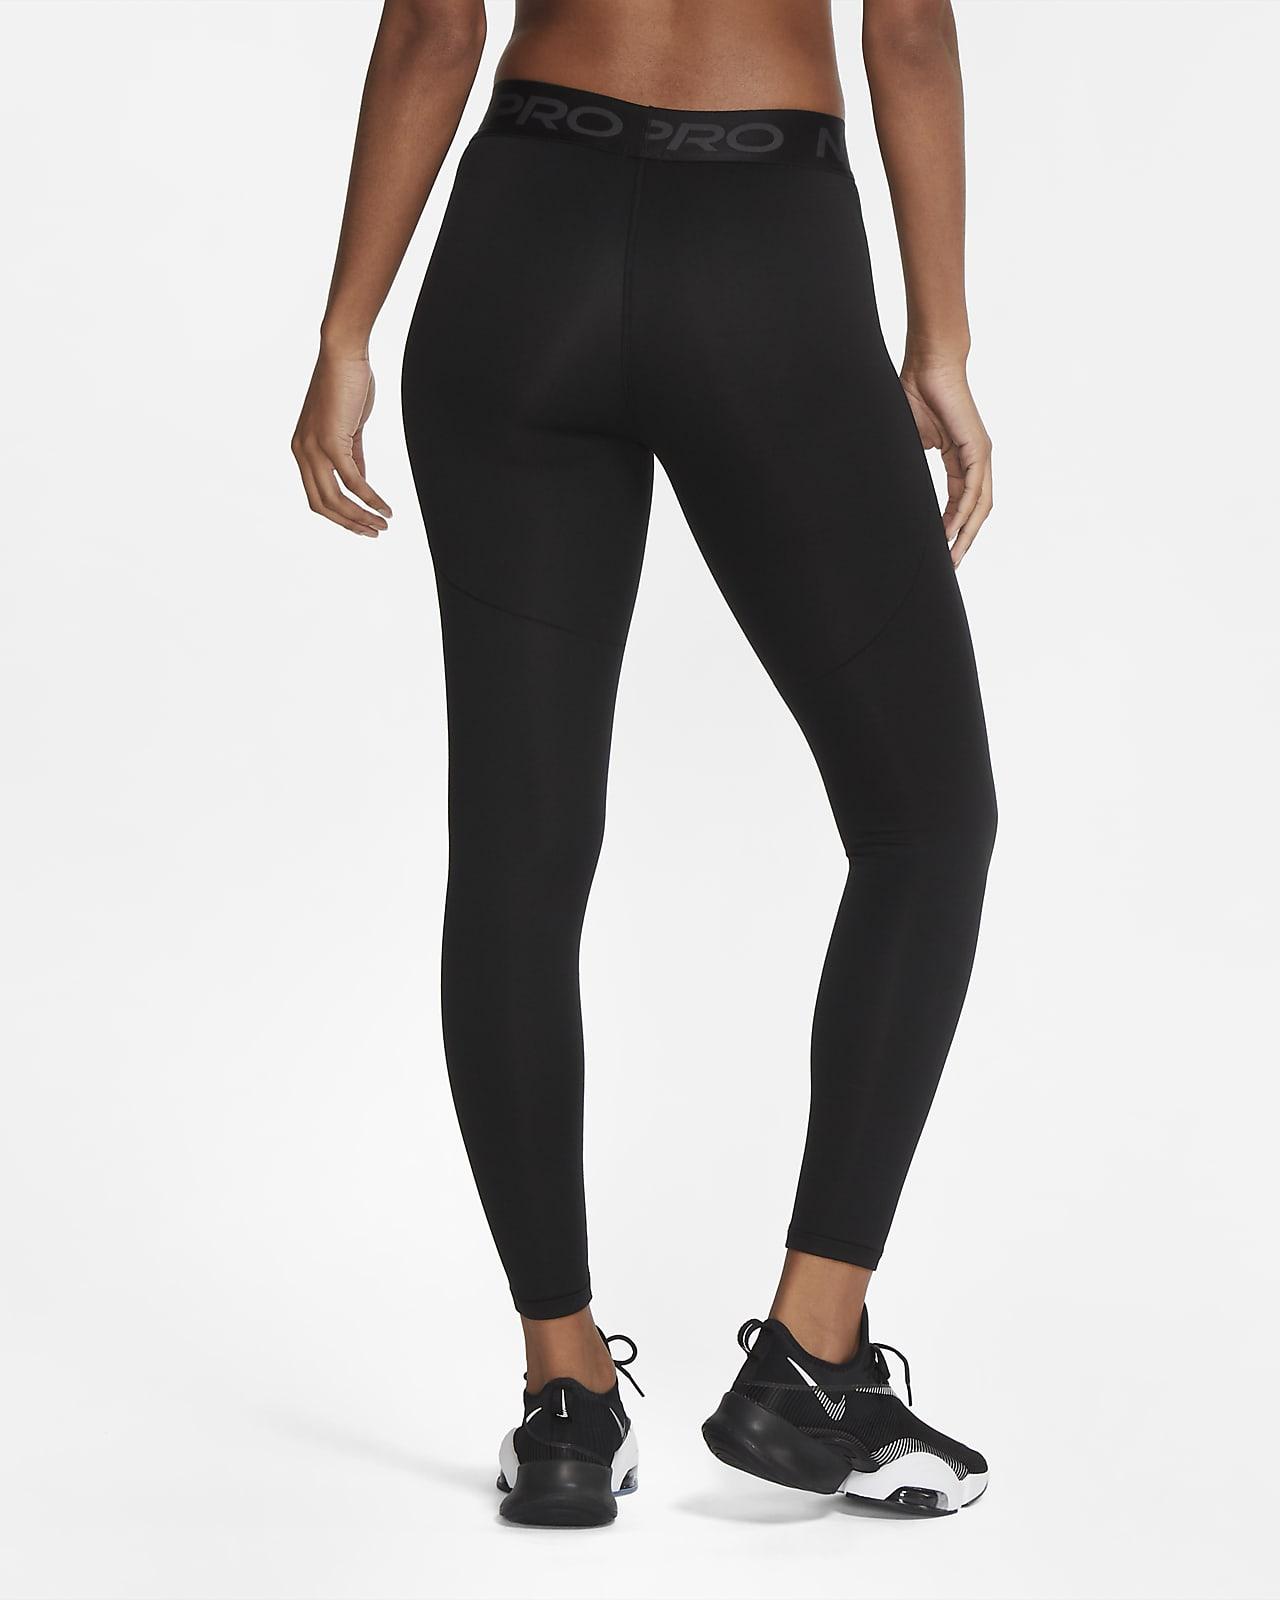 En riesgo Emperador cartucho  Legging Nike Pro Therma pour Femme. Nike FR